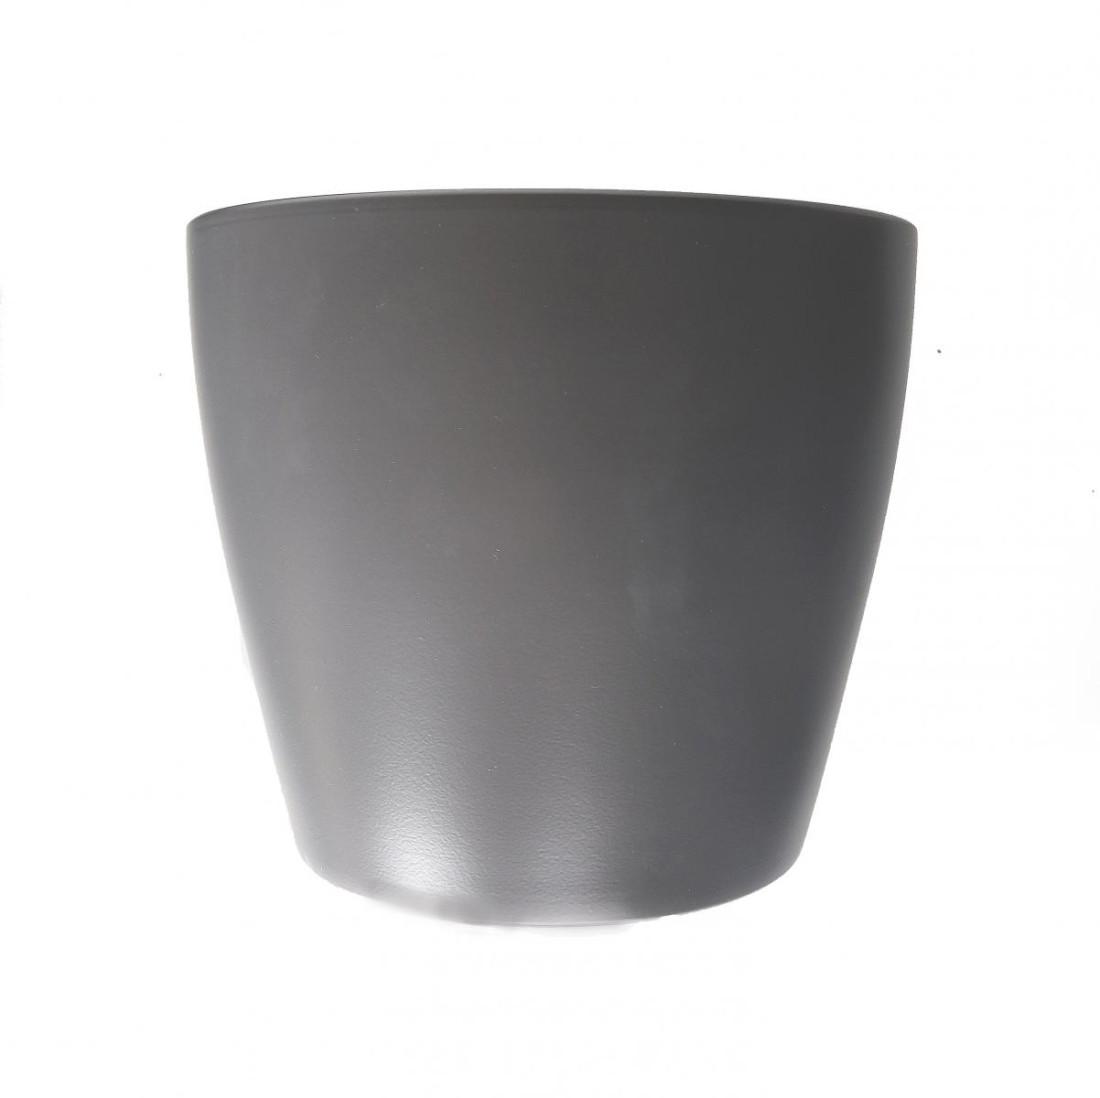 Topf aus Keramik-Grau